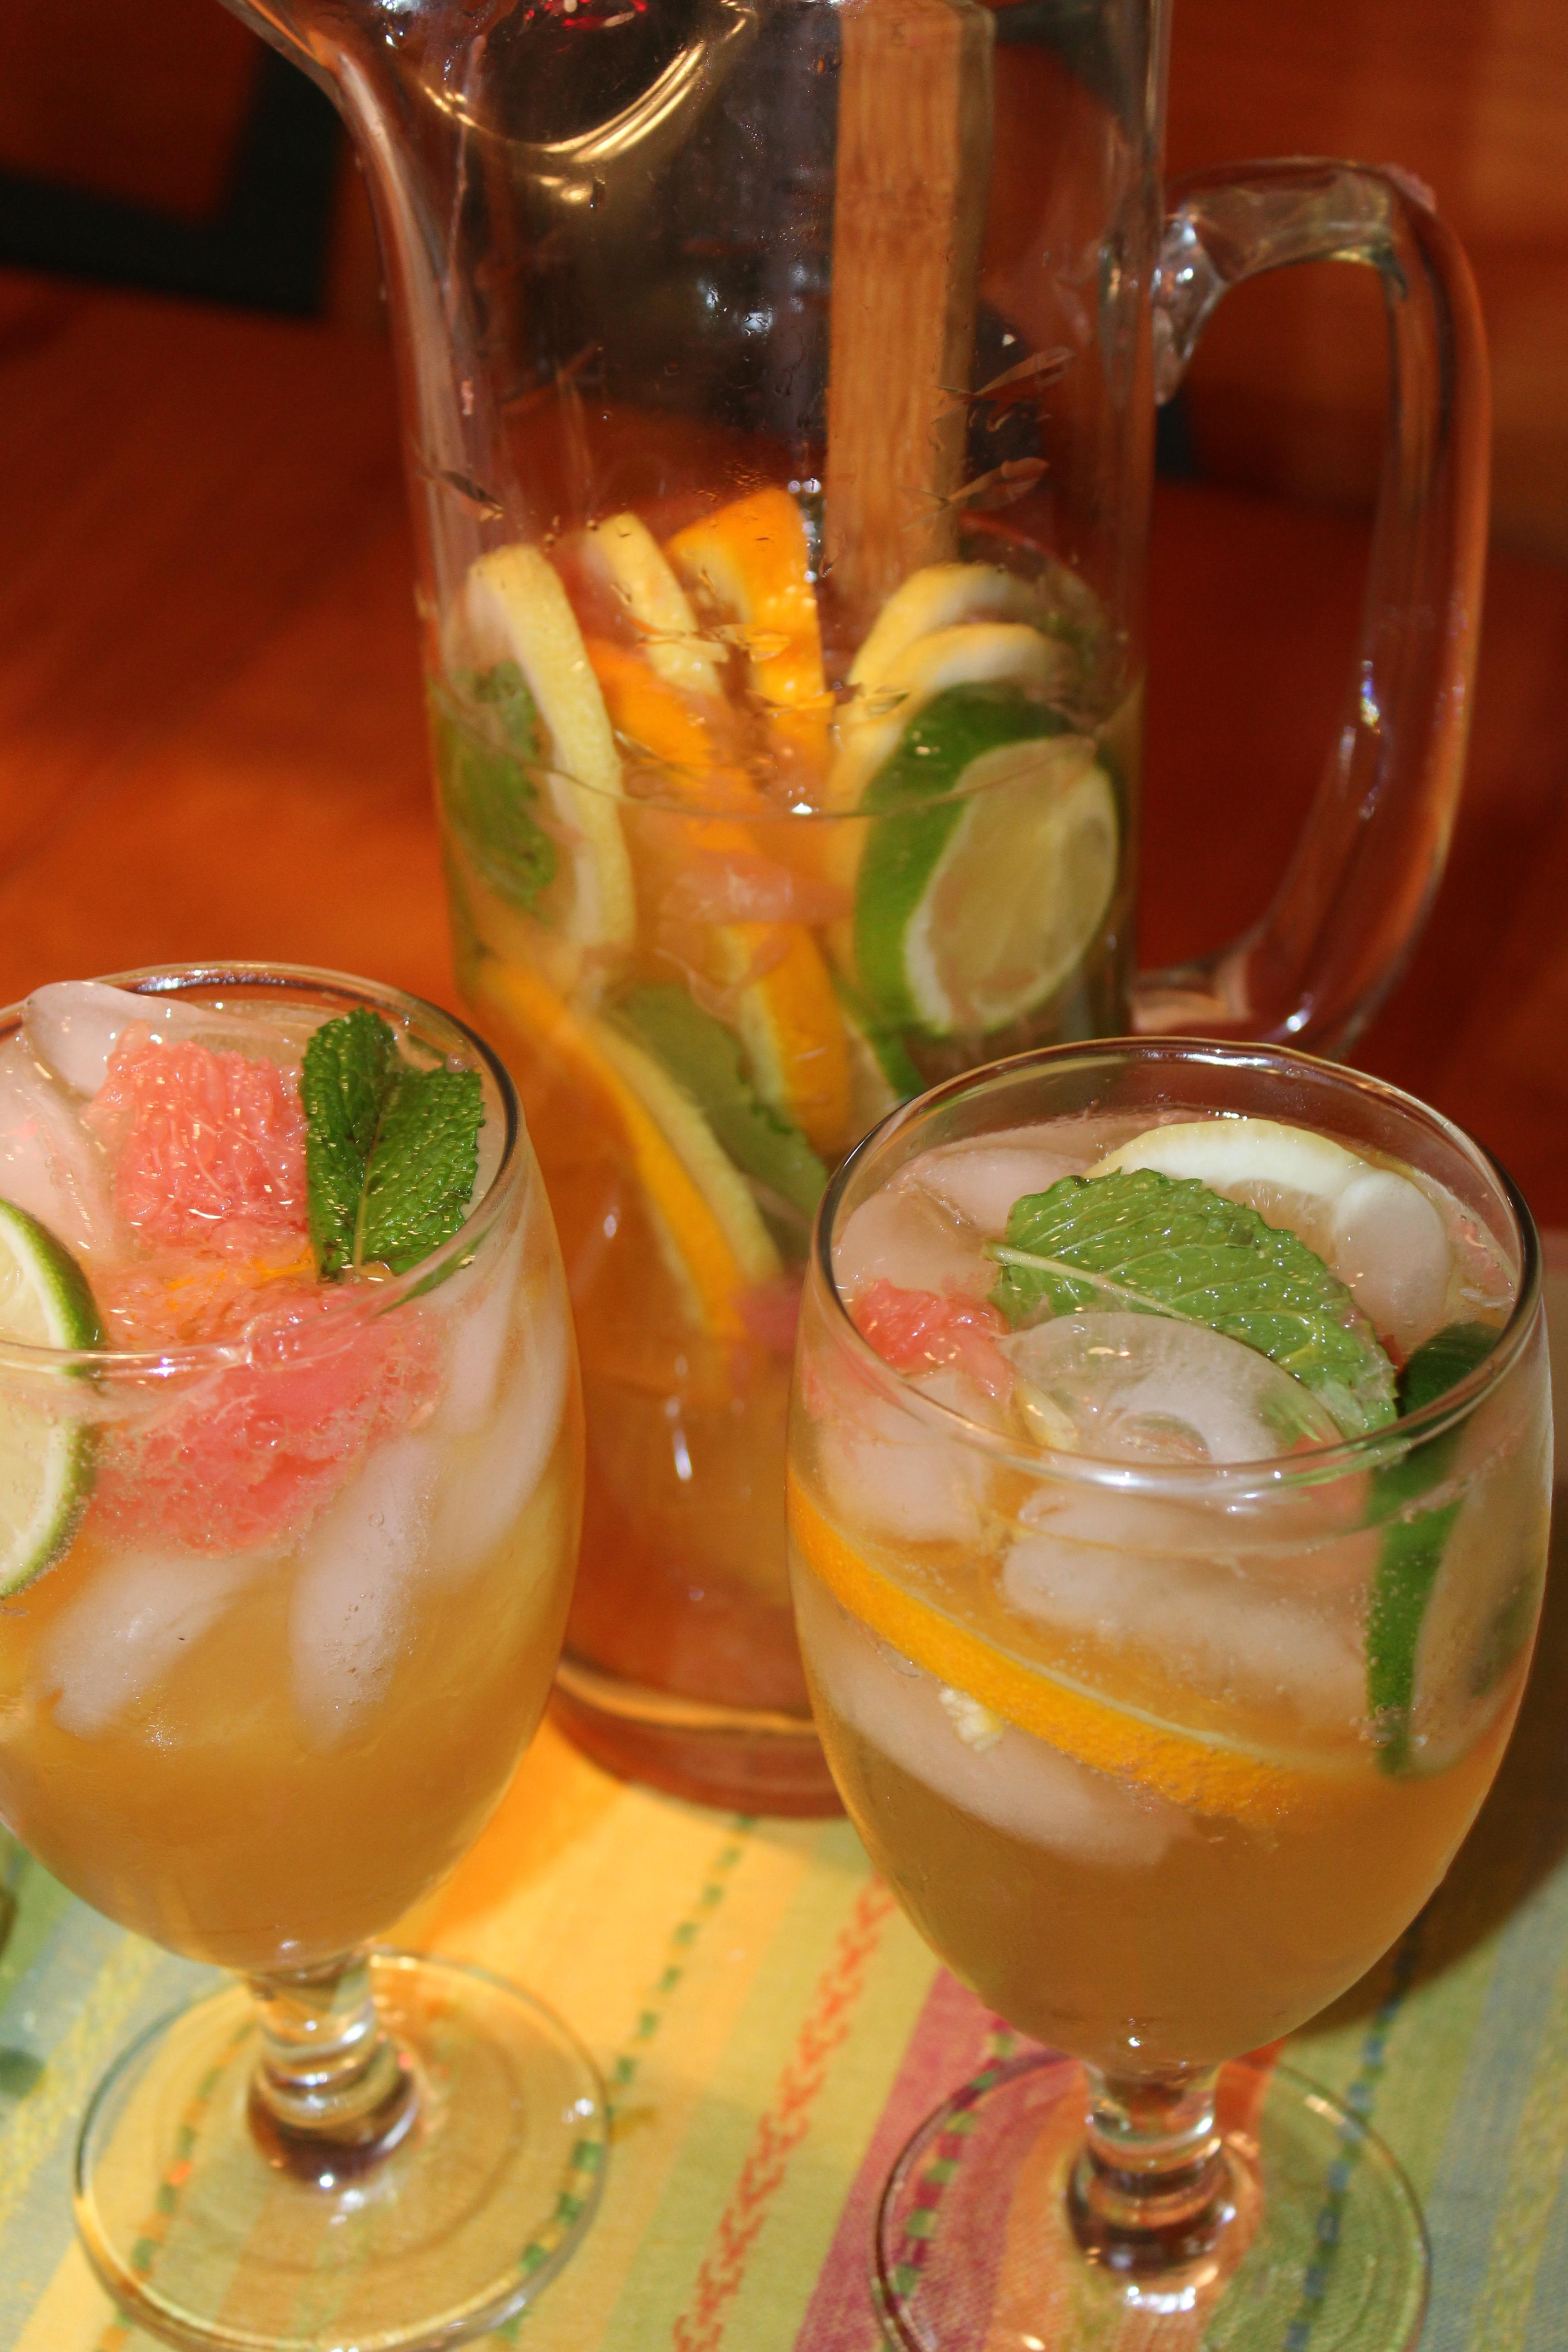 Kel's Summertime Citrusy Sangria